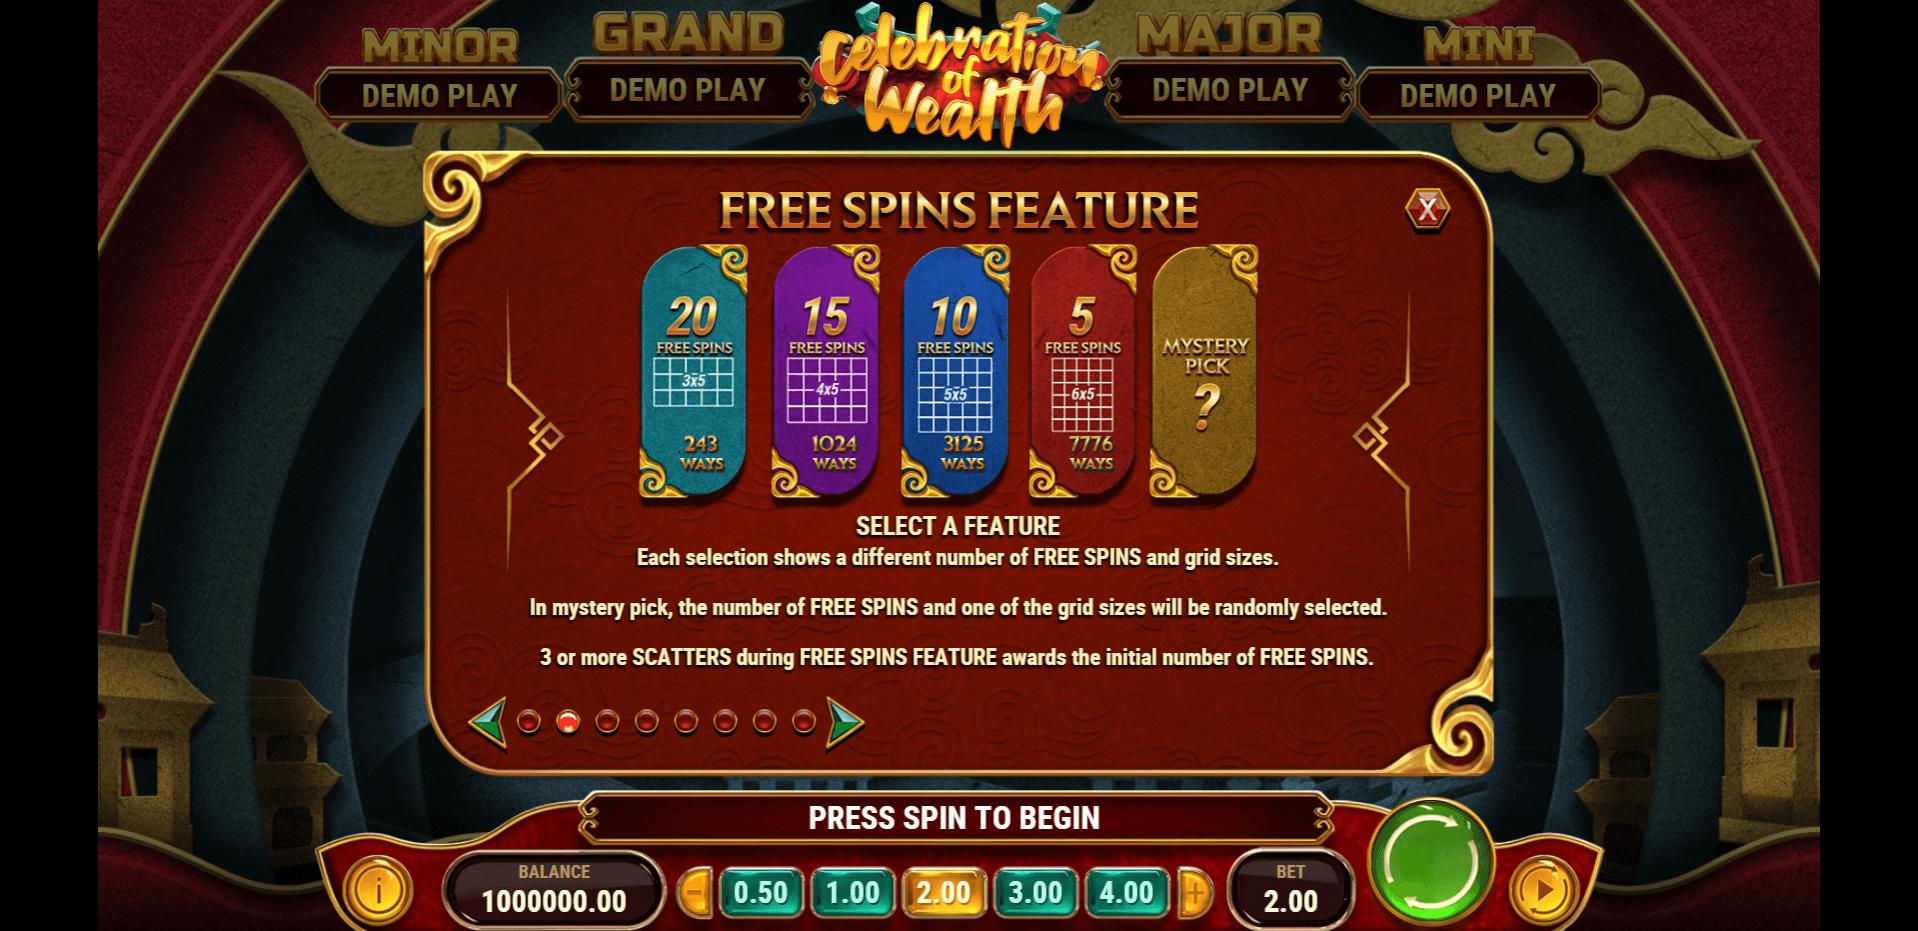 Celebration Of Wealth Slot Machine